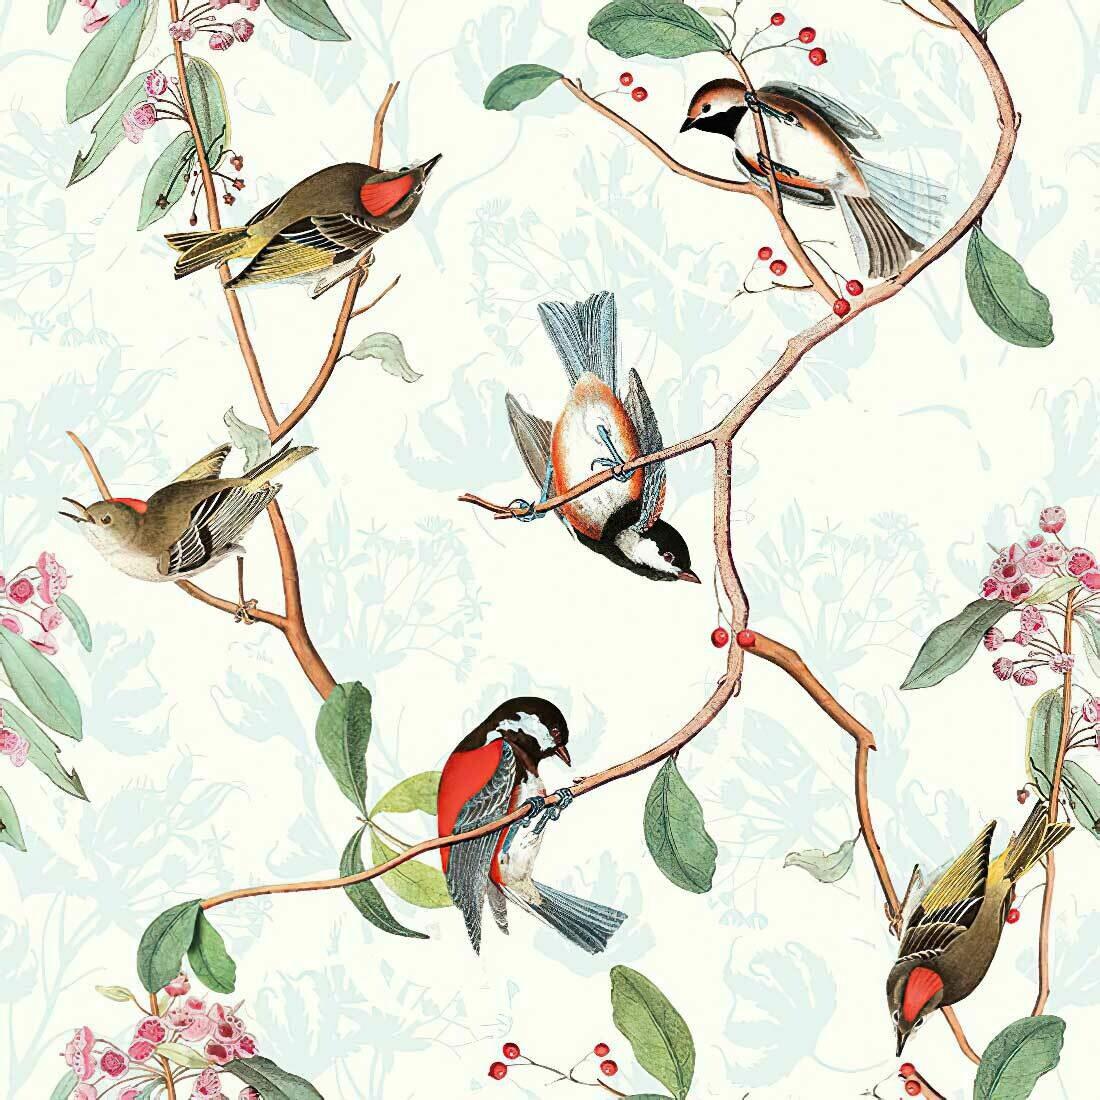 Decoupage Paper Napkins - Bird - Birdsong (1 Sheet)